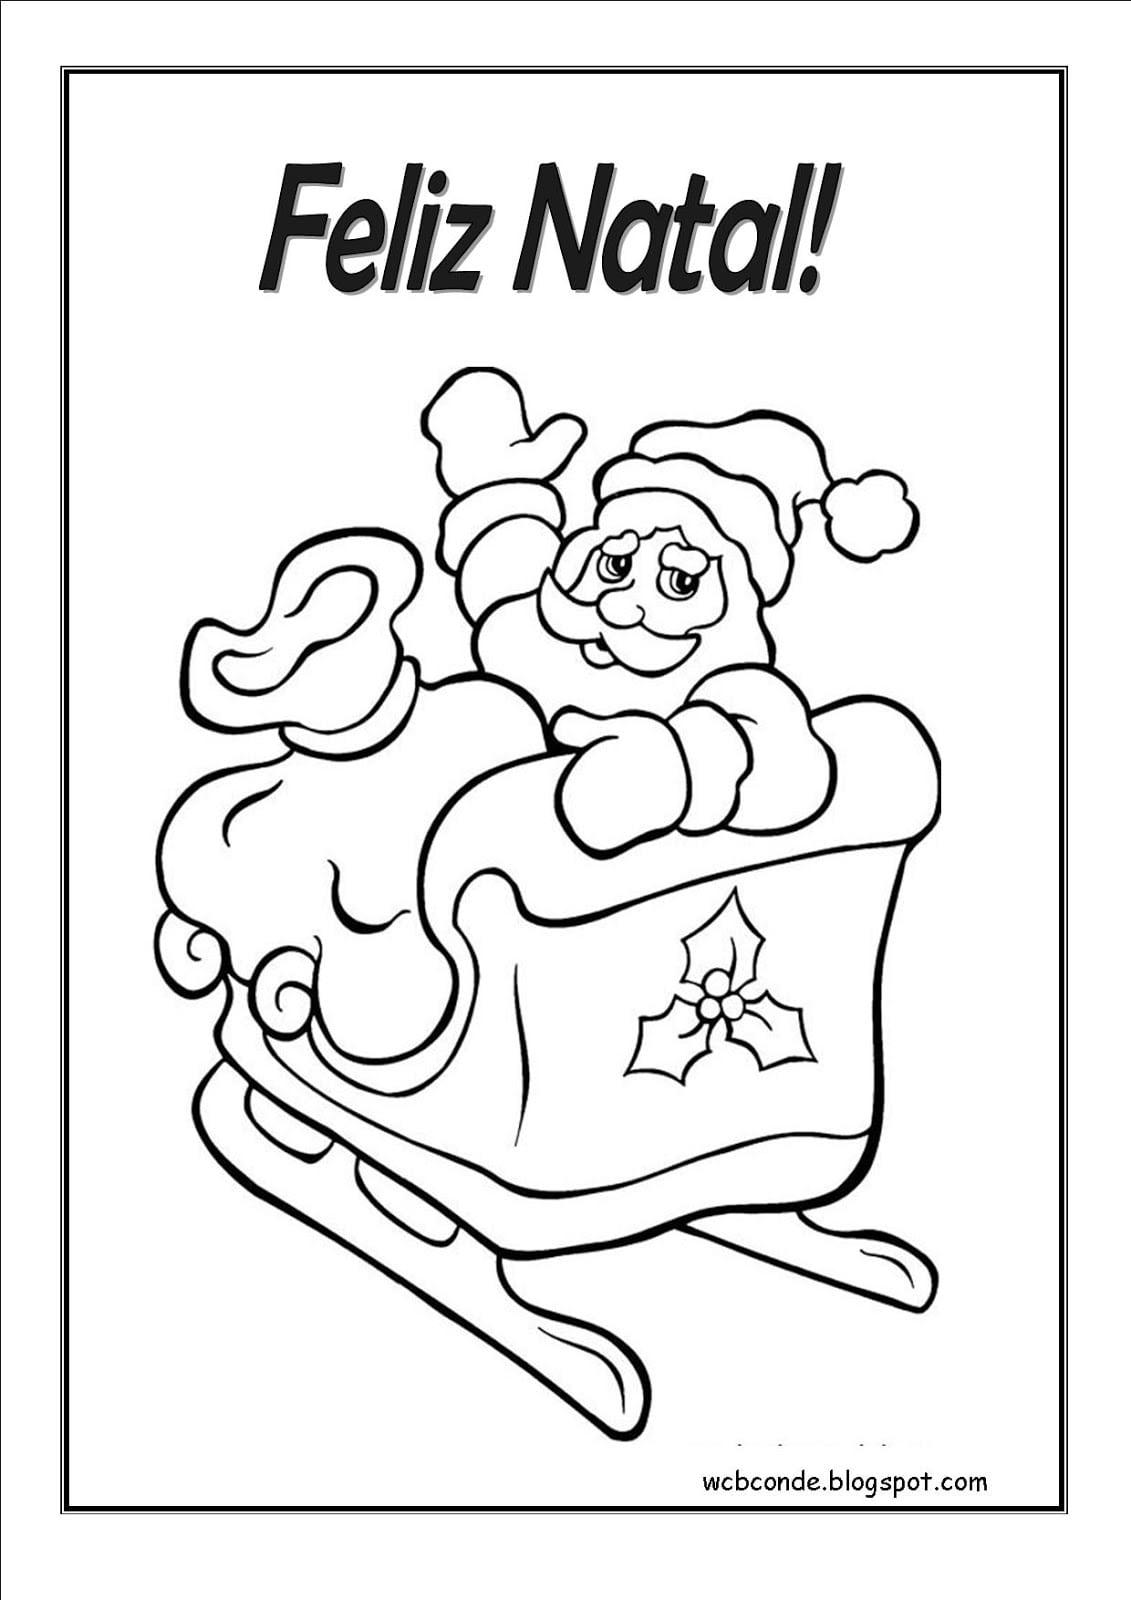 Imagens De Papai Noel No Trenó Para Colorir